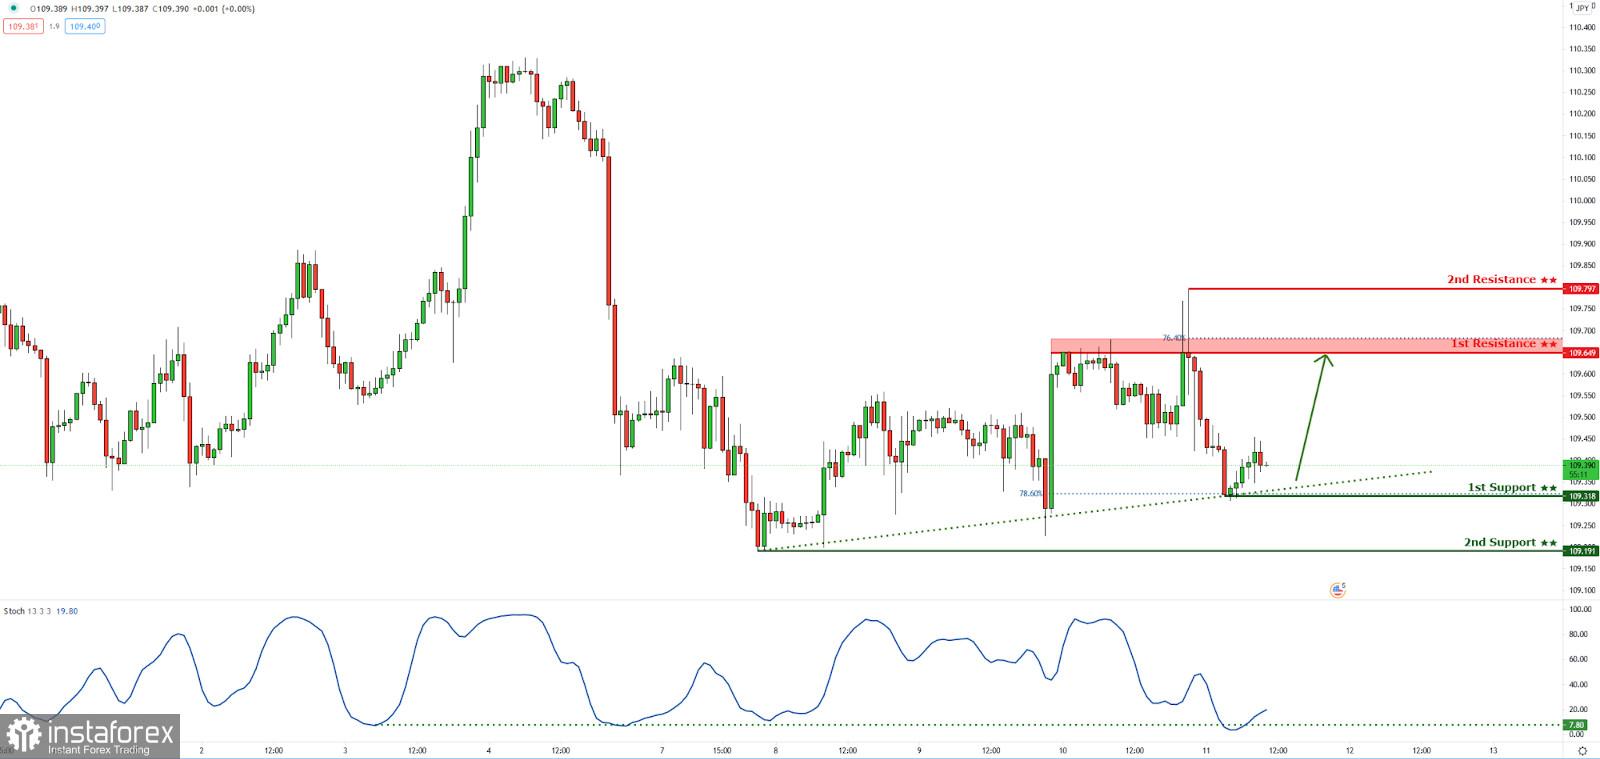 USDJPY reacting above ascending trendline support! Bounce incoming!